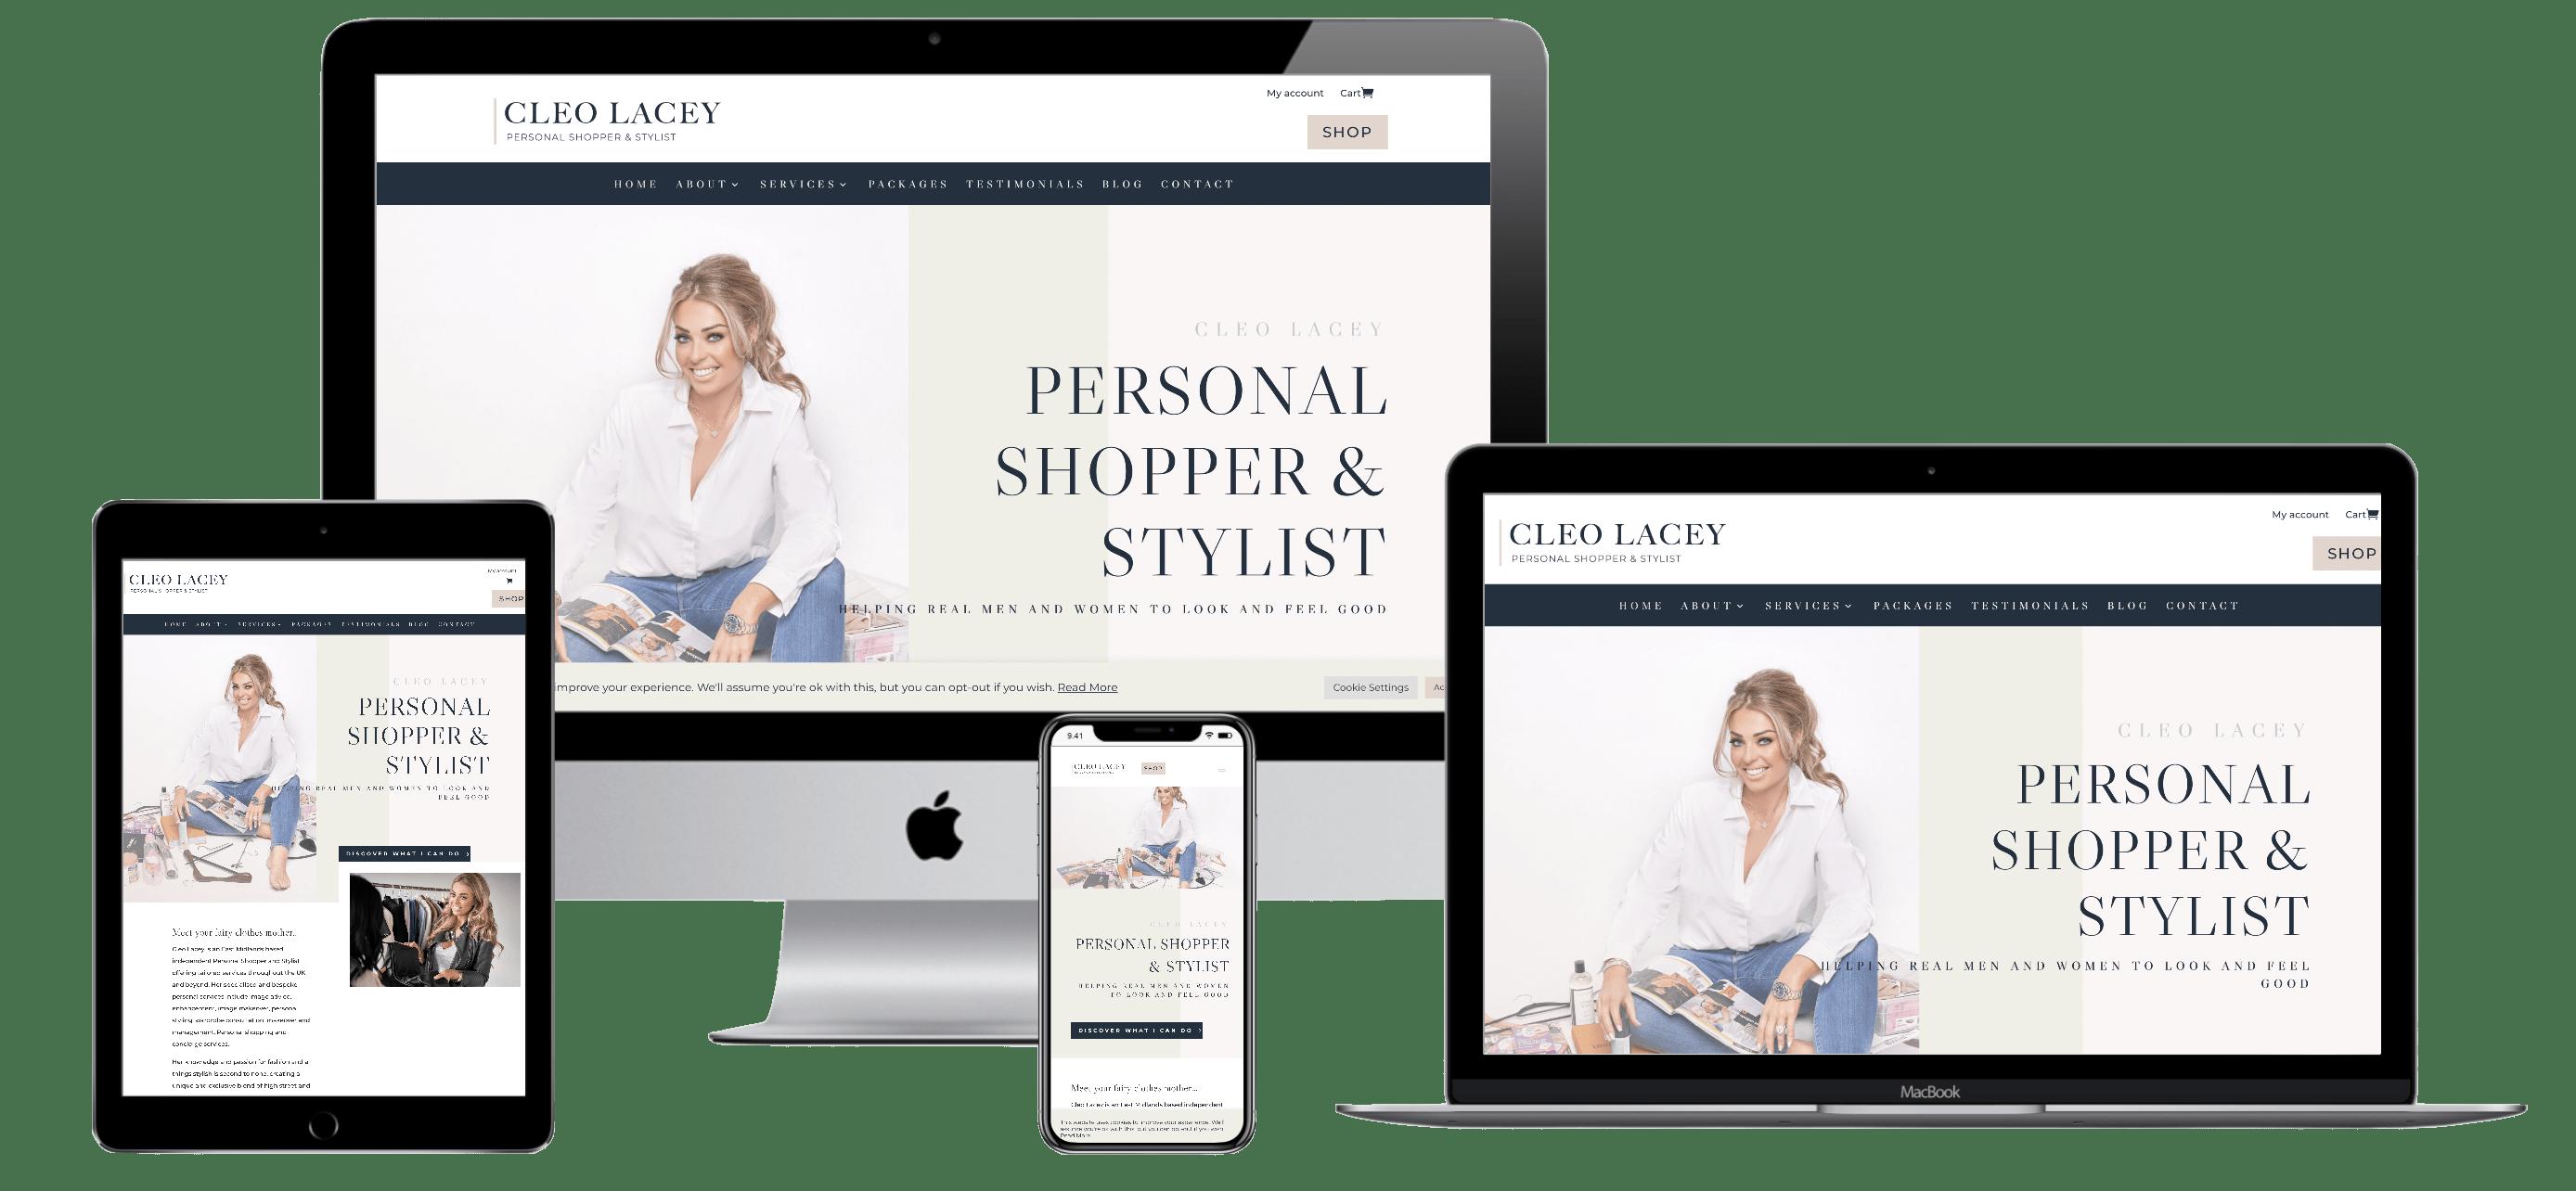 Cleo Lacey website design